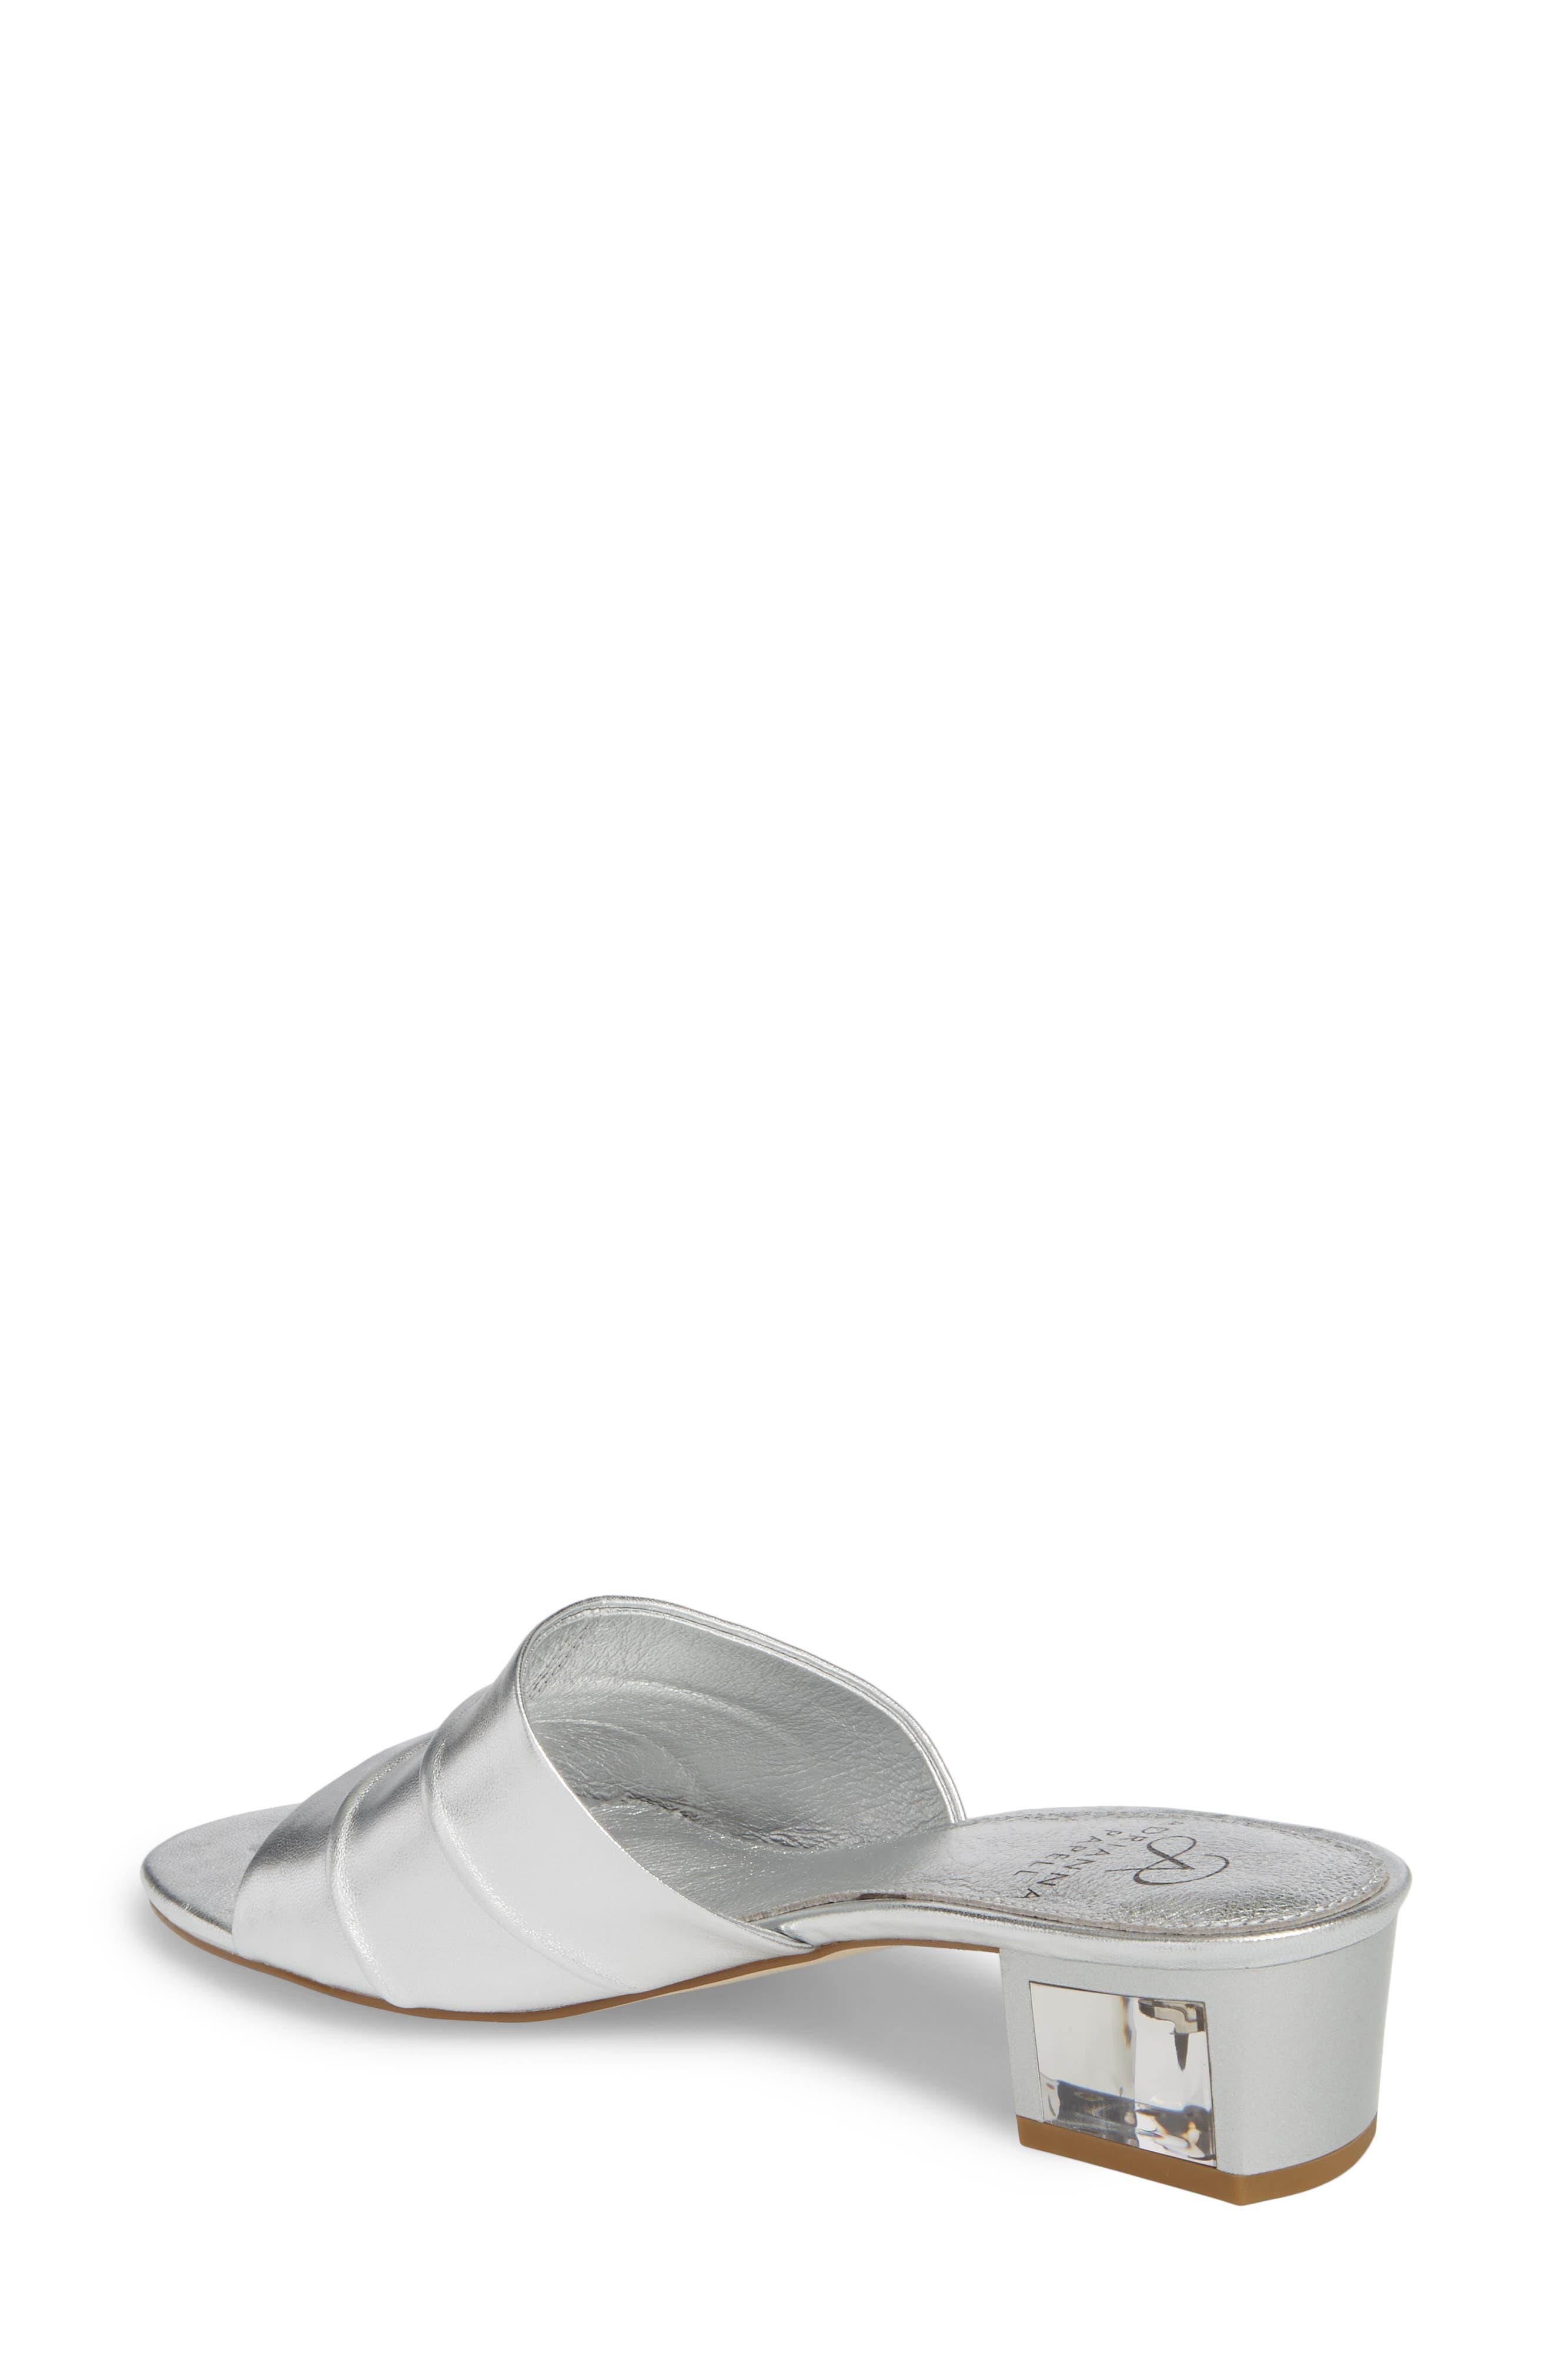 Tiana Block Heel Slide Sandal,                             Alternate thumbnail 2, color,                             SILVER LEATHER